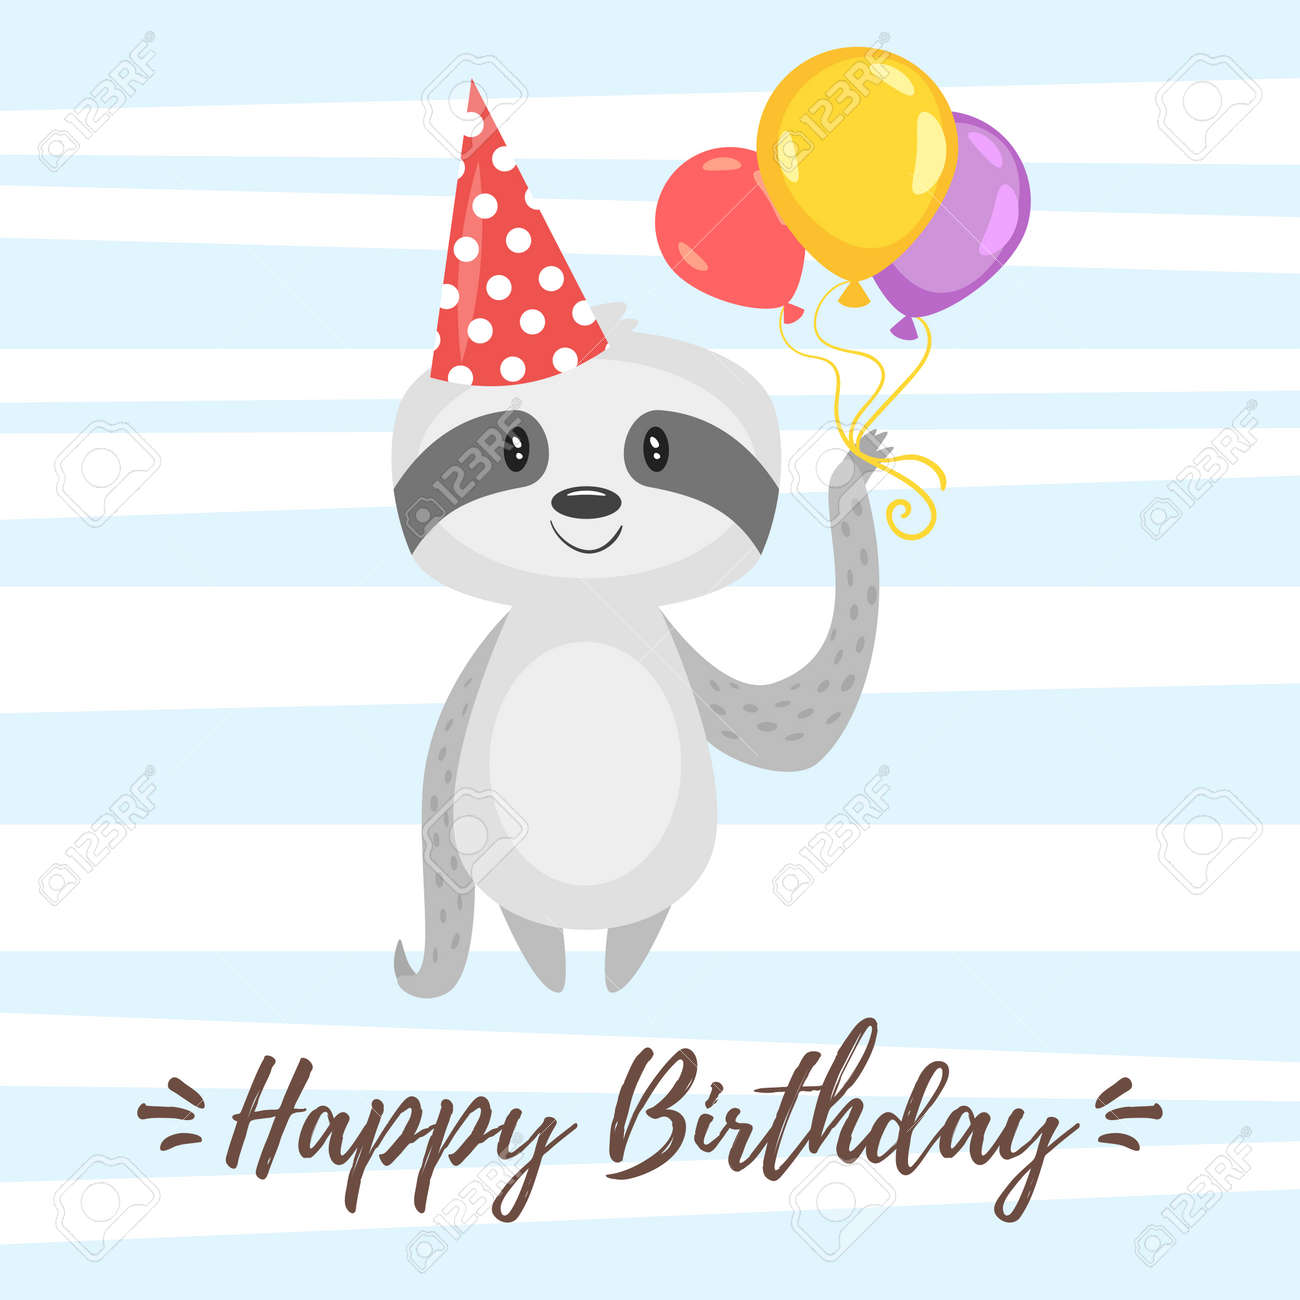 Vector Cartoon Style Illustration Of Happy Birthday Greeting